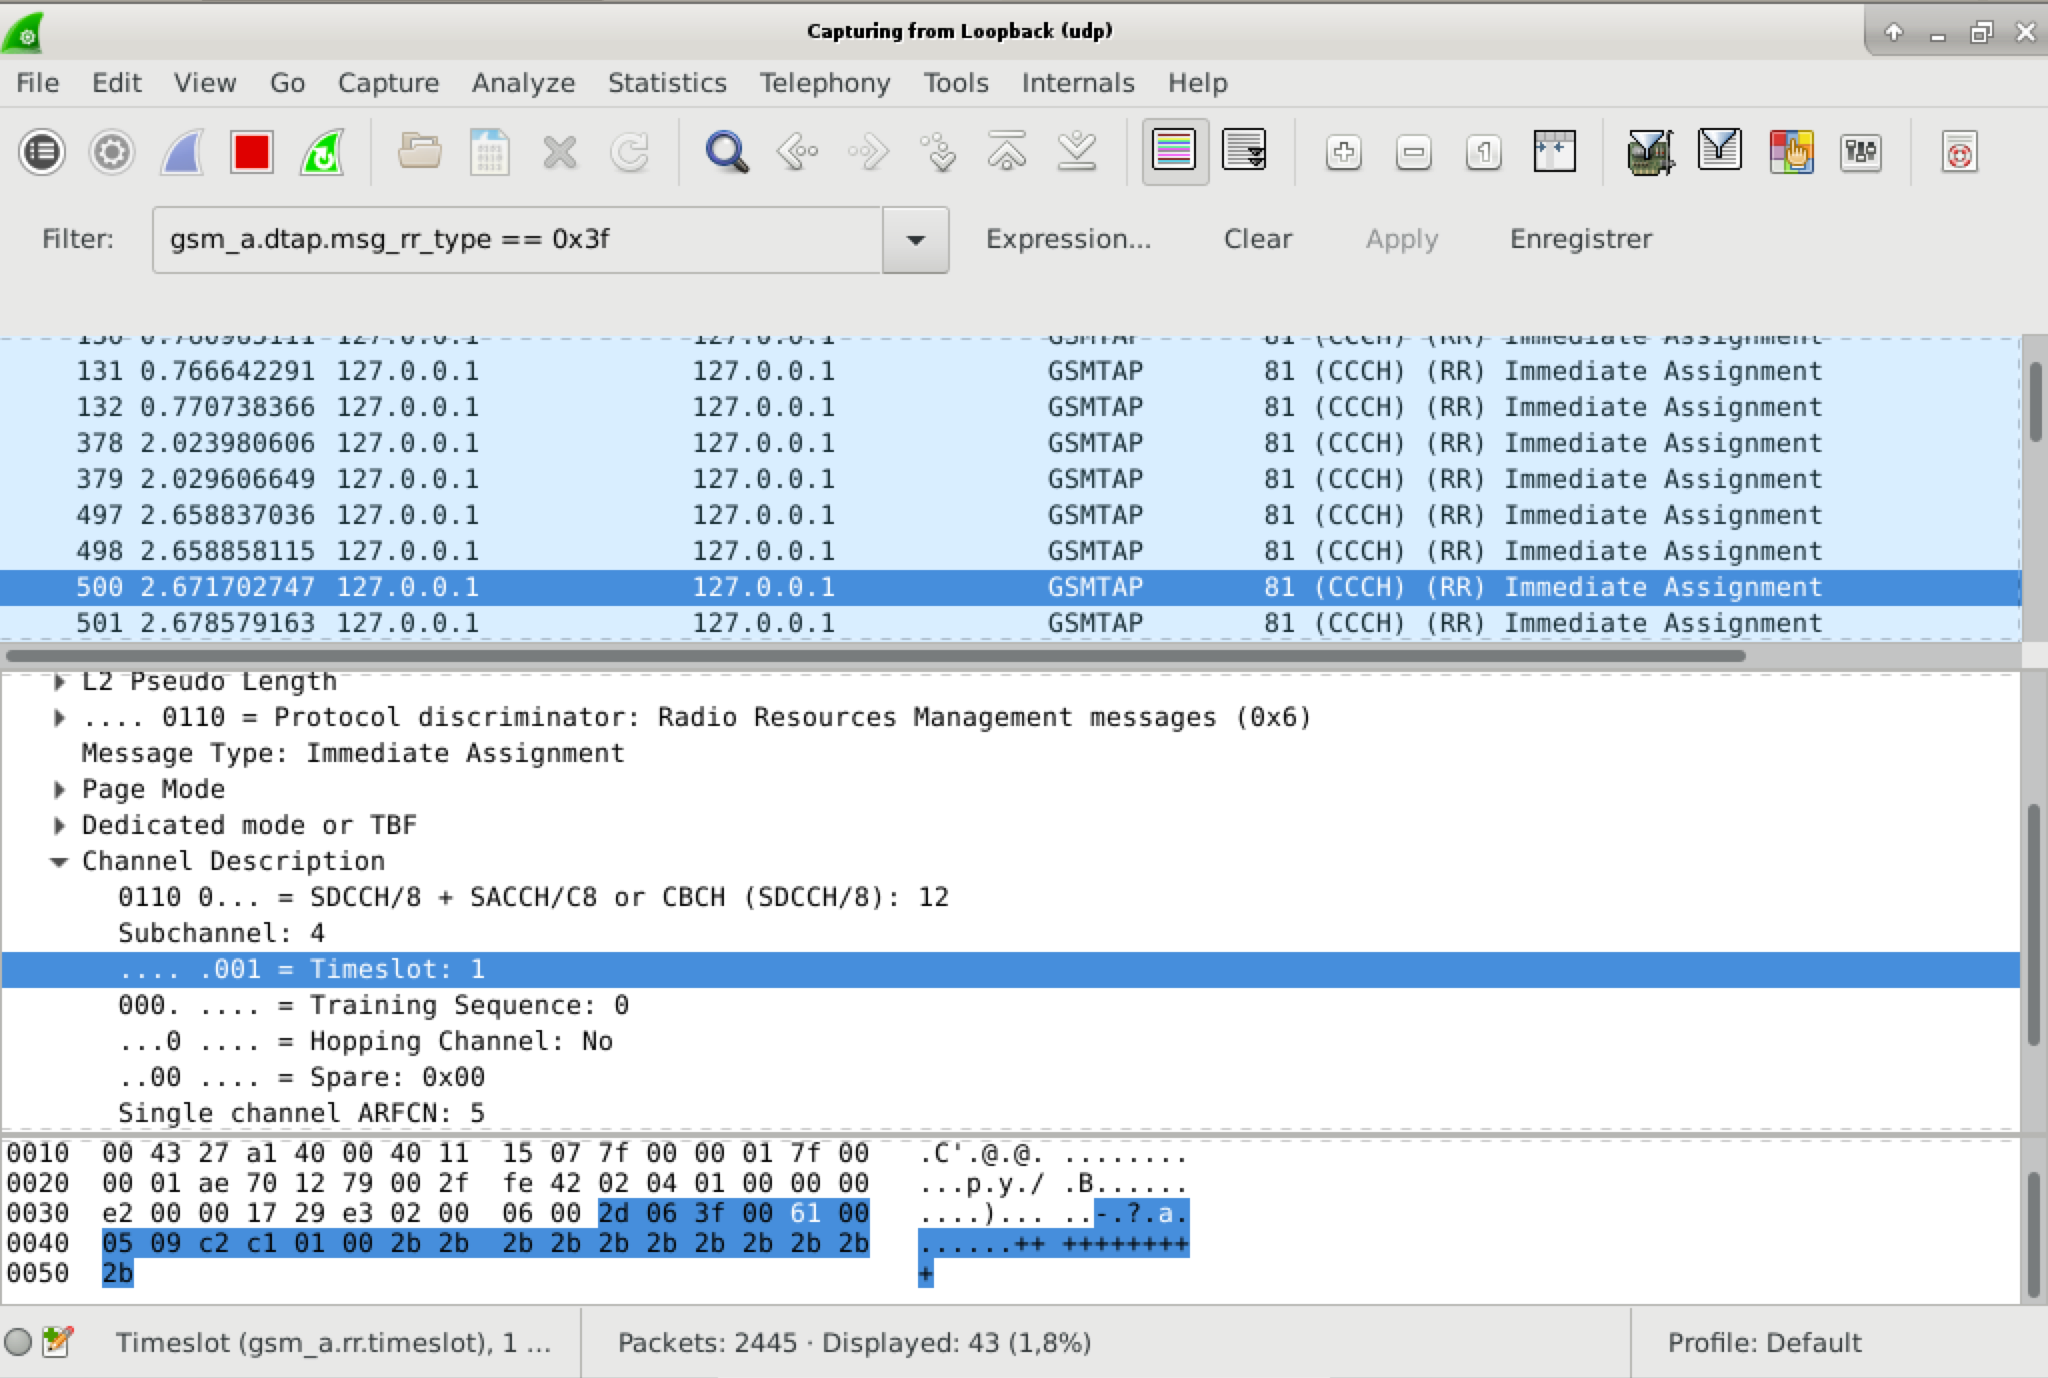 capture d'écran wireshark montrant un Immediate Assignement